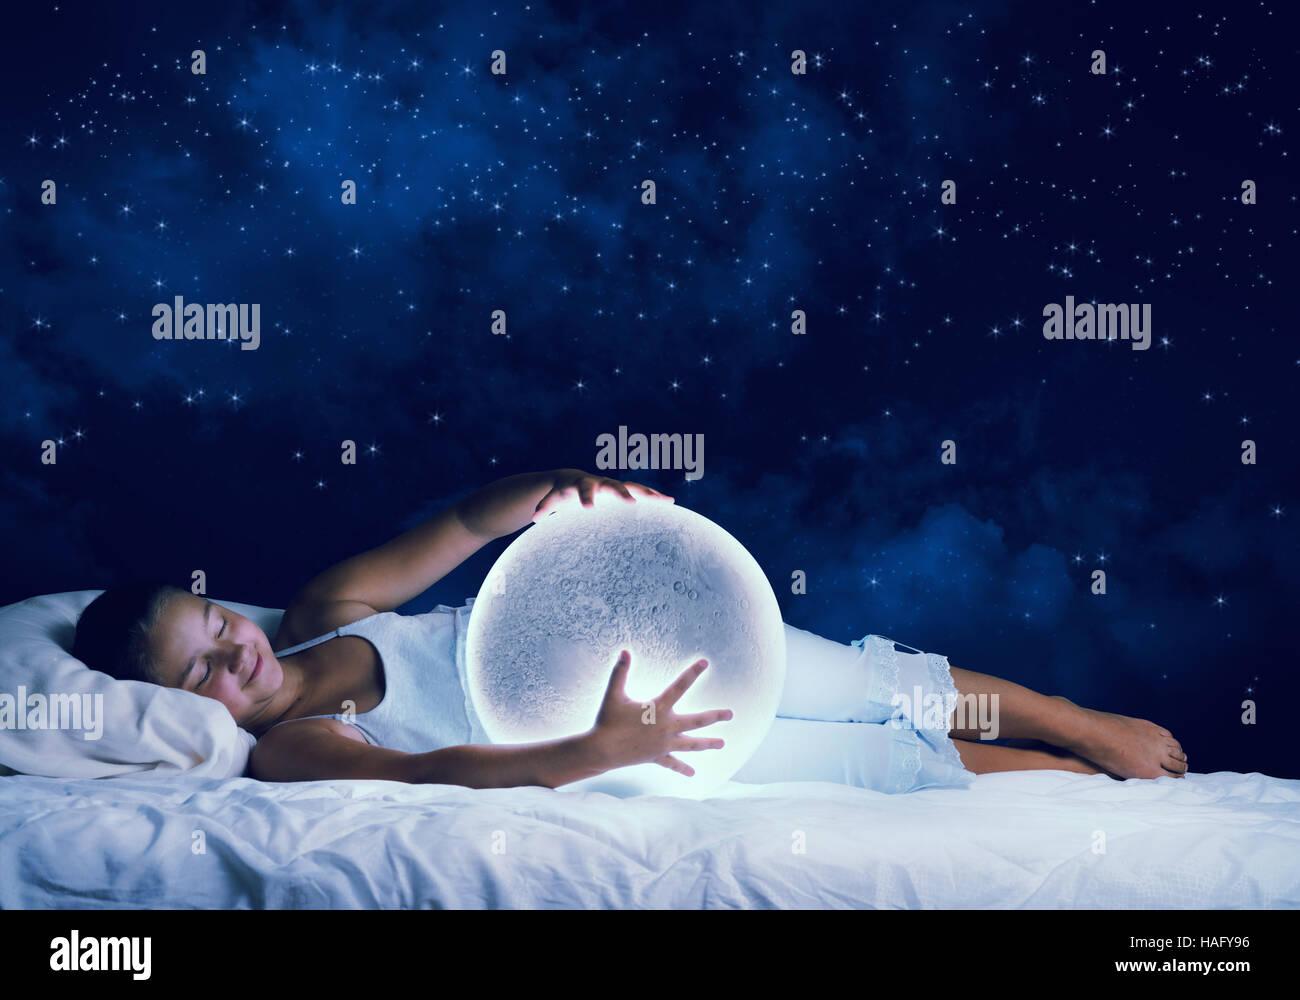 Girl dreaming before sleep - Stock Image